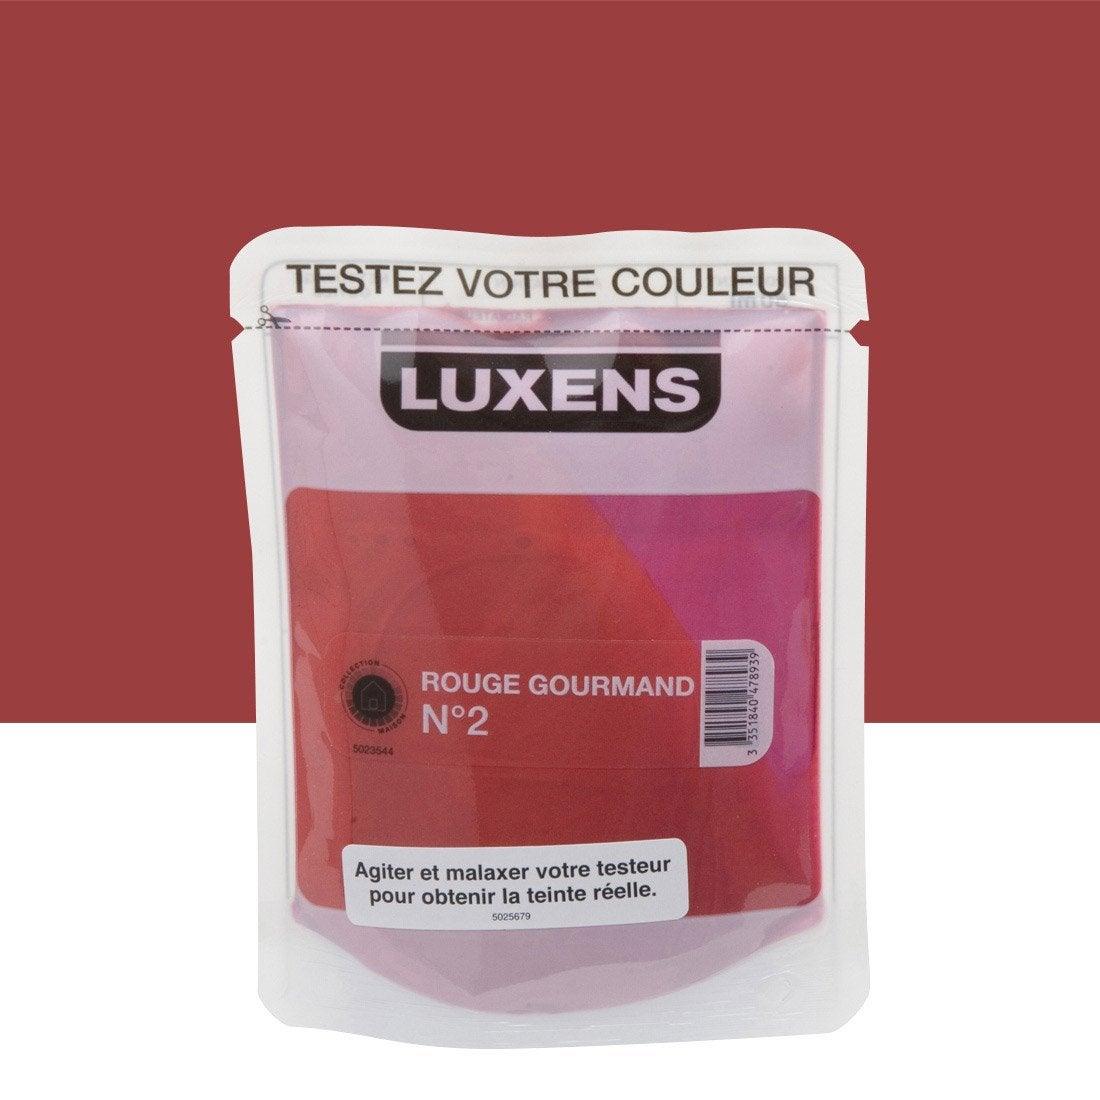 testeur peinture rouge gourmand 2 luxens couleurs int rieures satin l leroy merlin. Black Bedroom Furniture Sets. Home Design Ideas